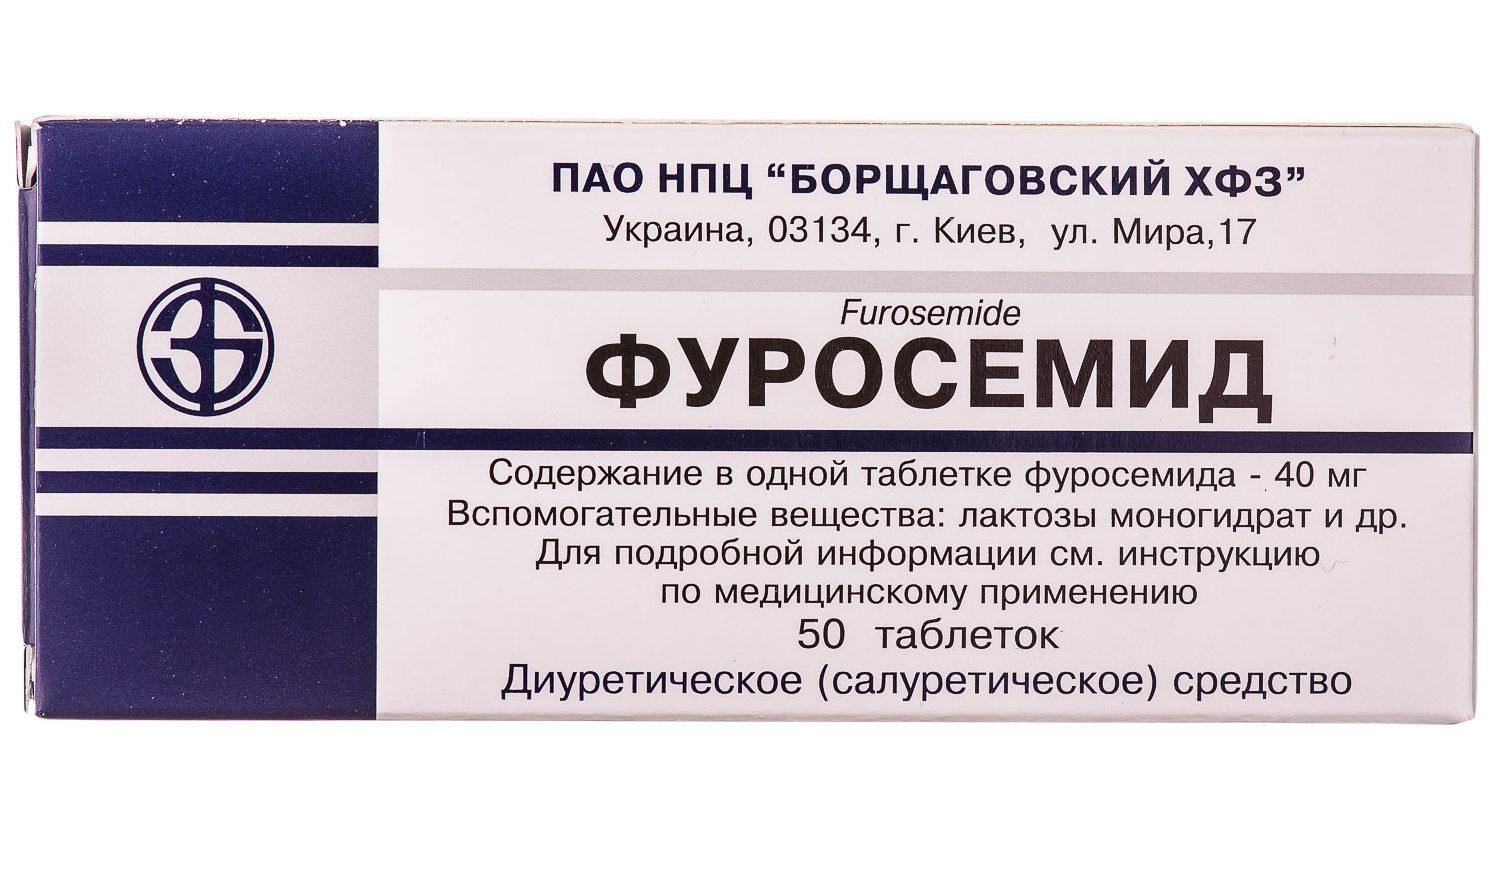 mogu li uzeti eufillin hipertenzije)